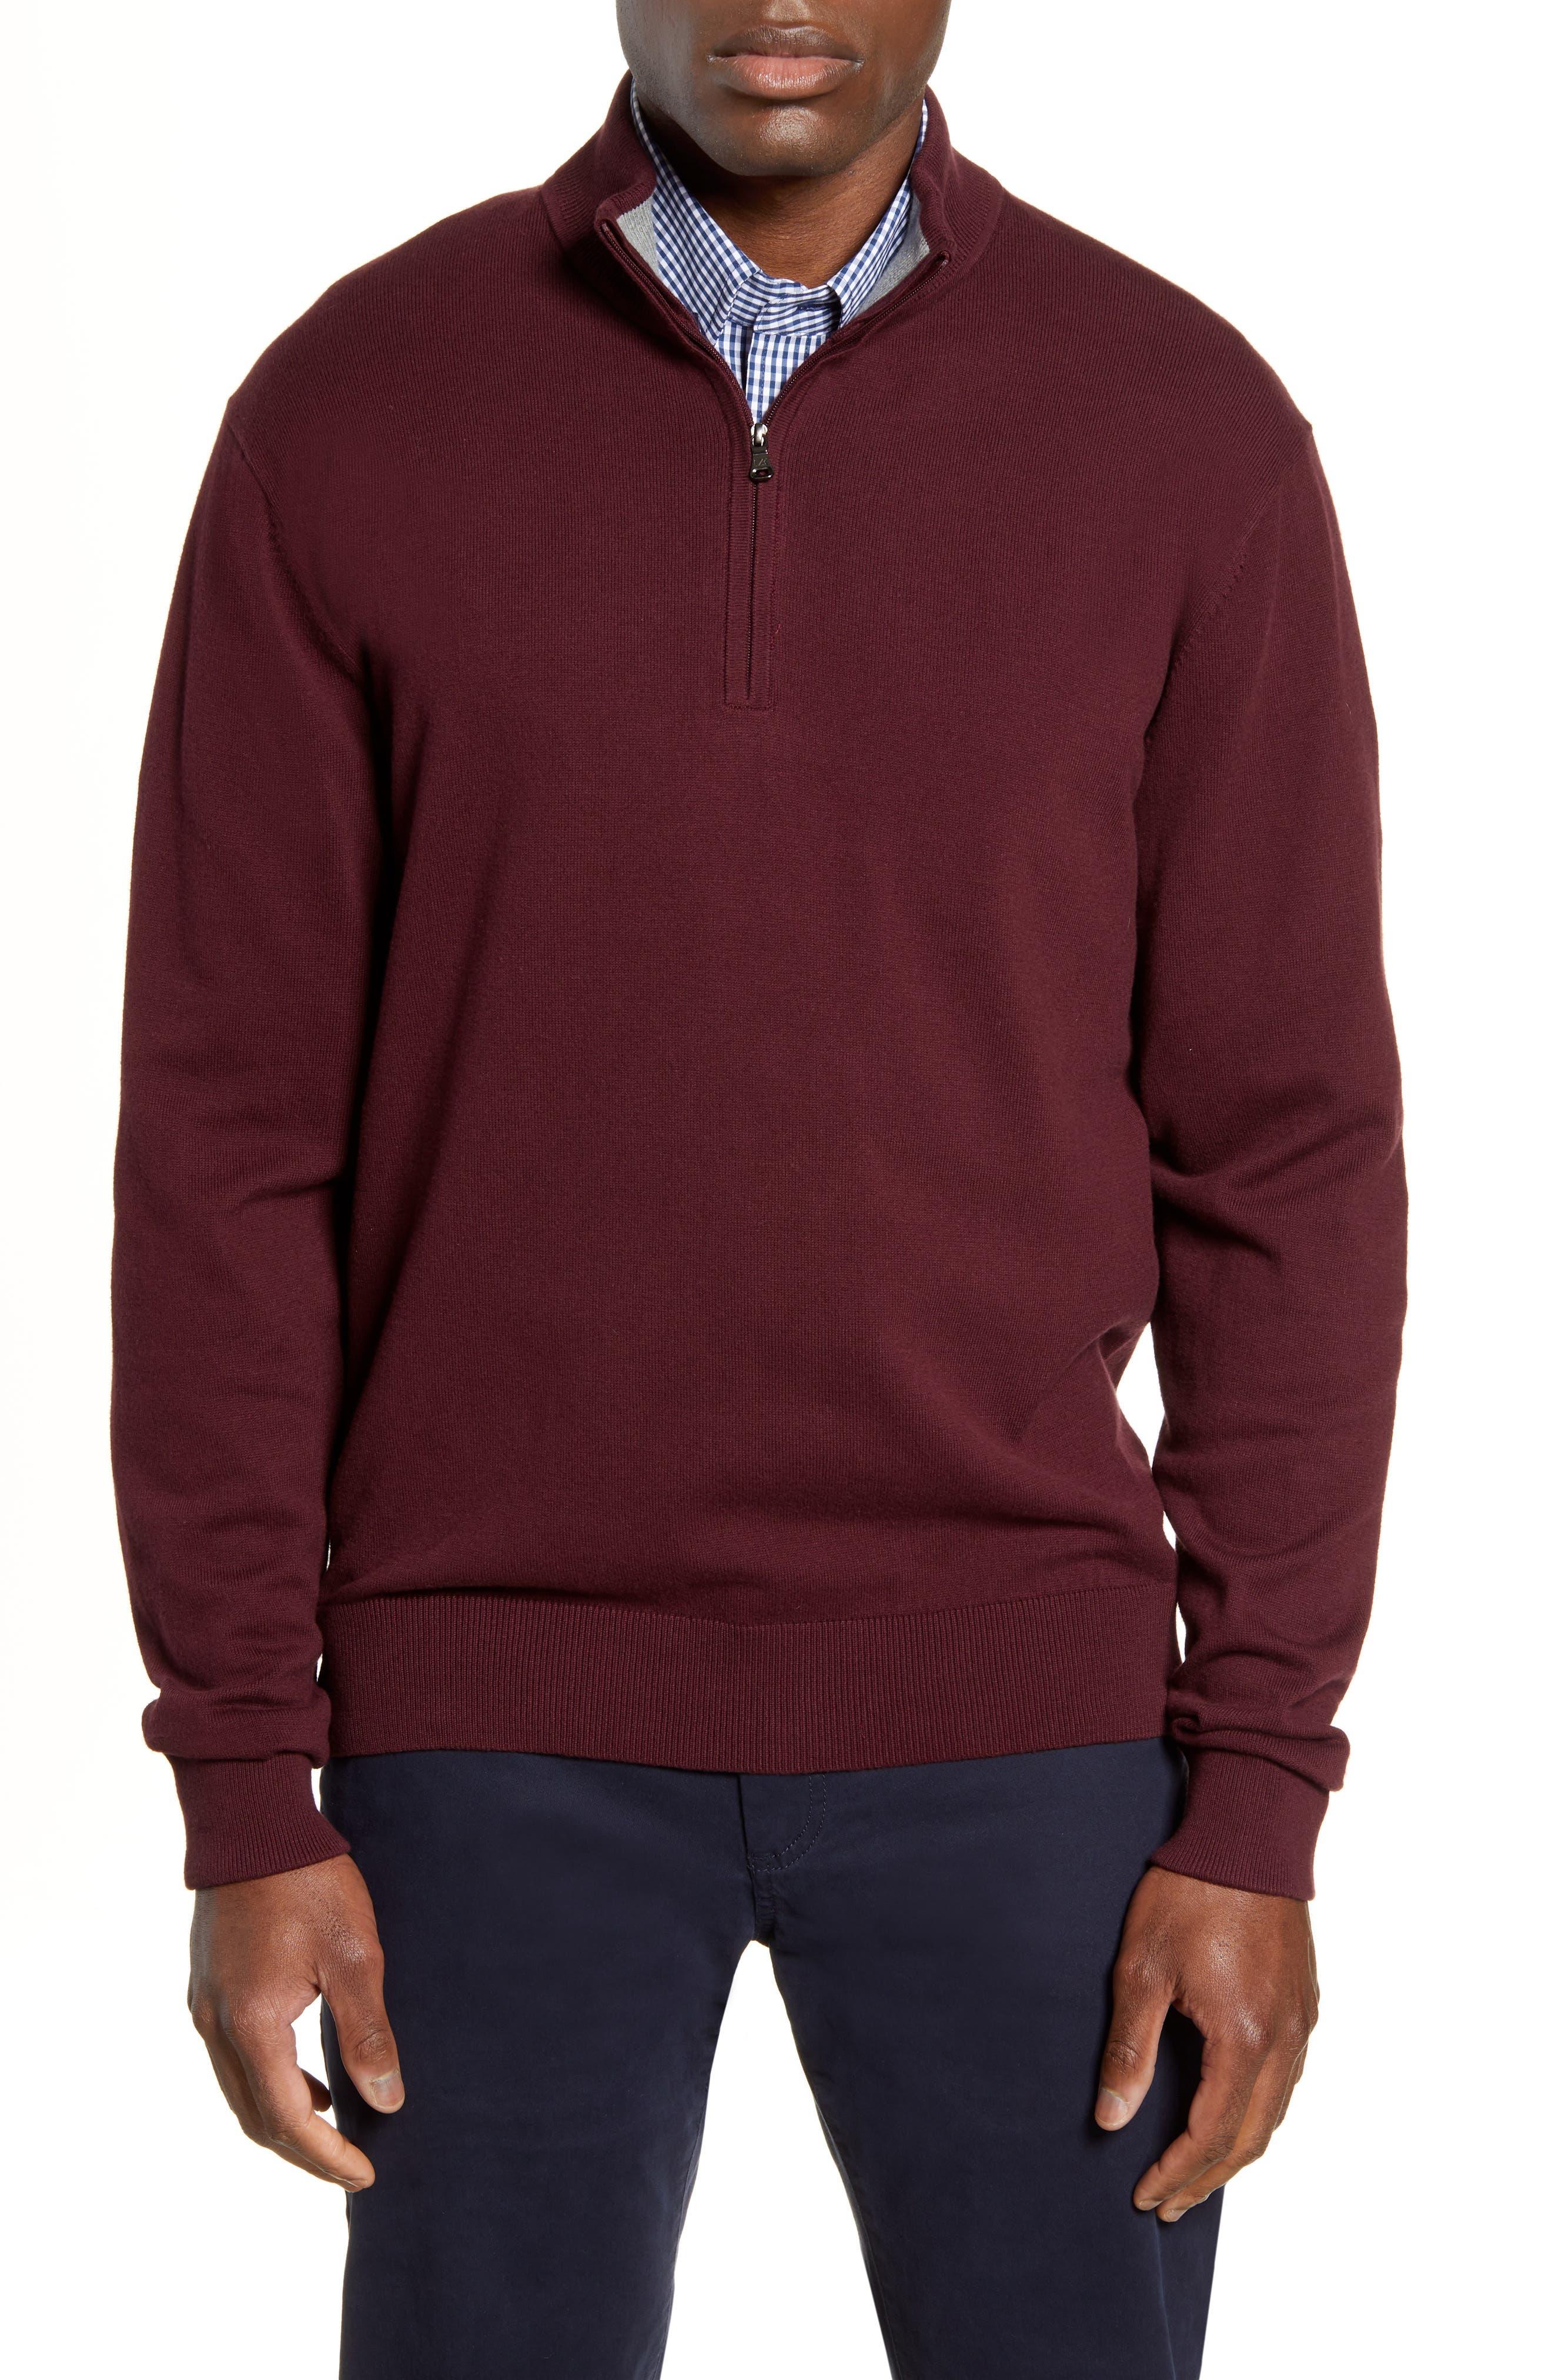 Cutter & Buck Lakemont Half Zip Sweater, Red